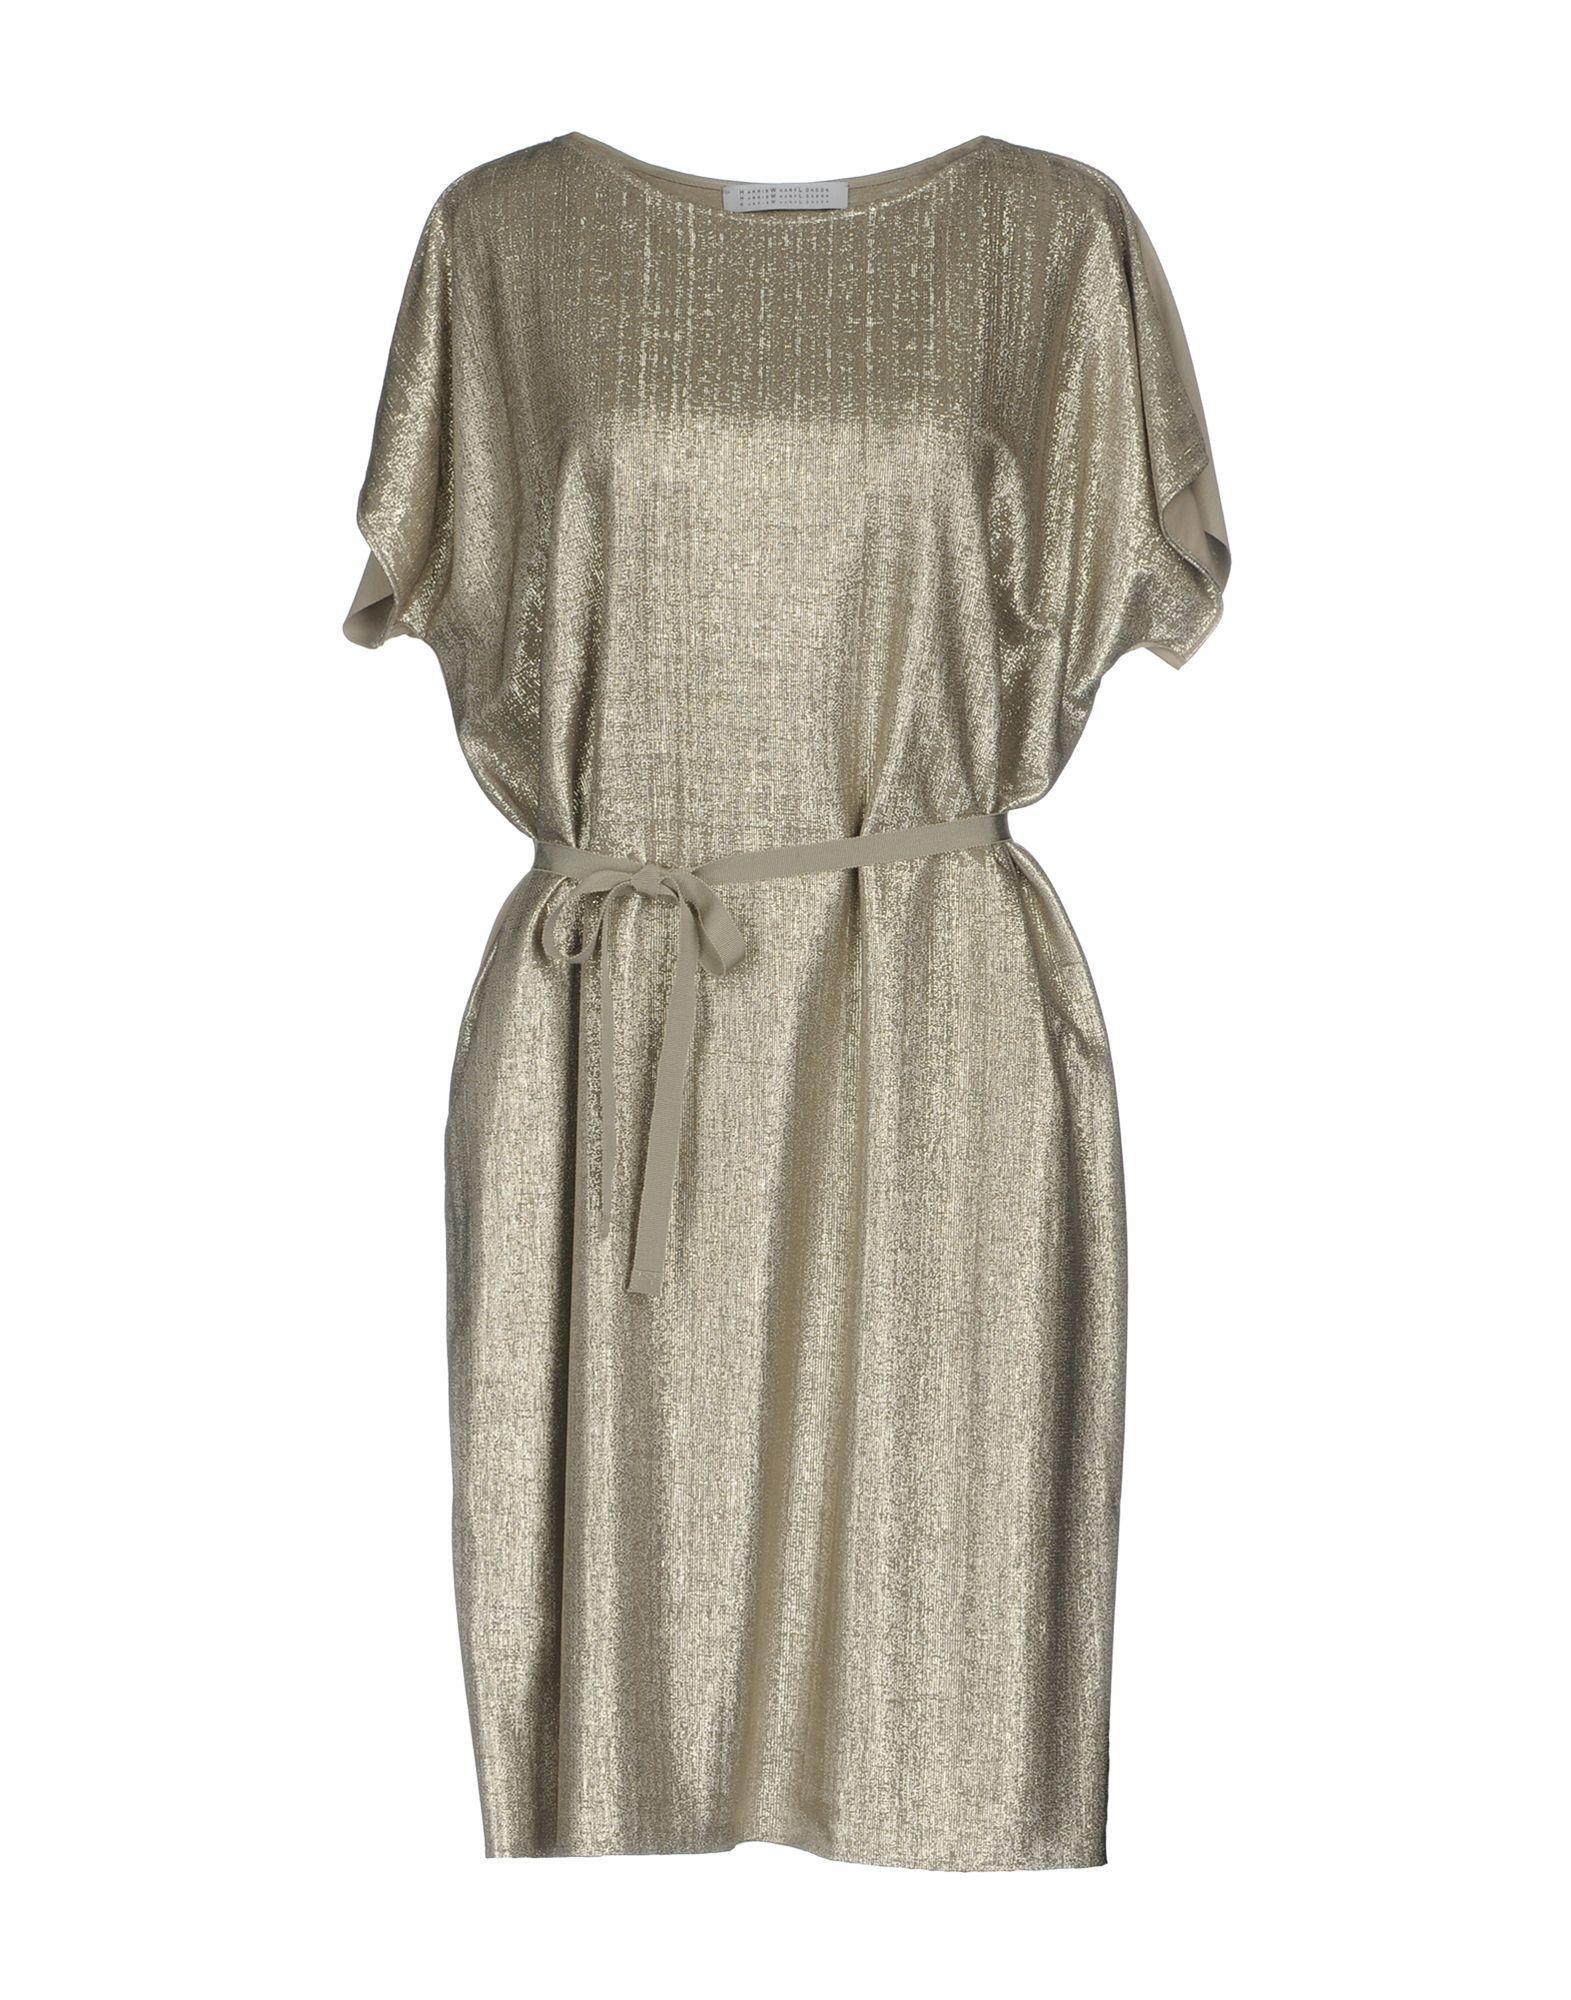 DRESSES - Short dresses Harris Wharf London Gl8erTm